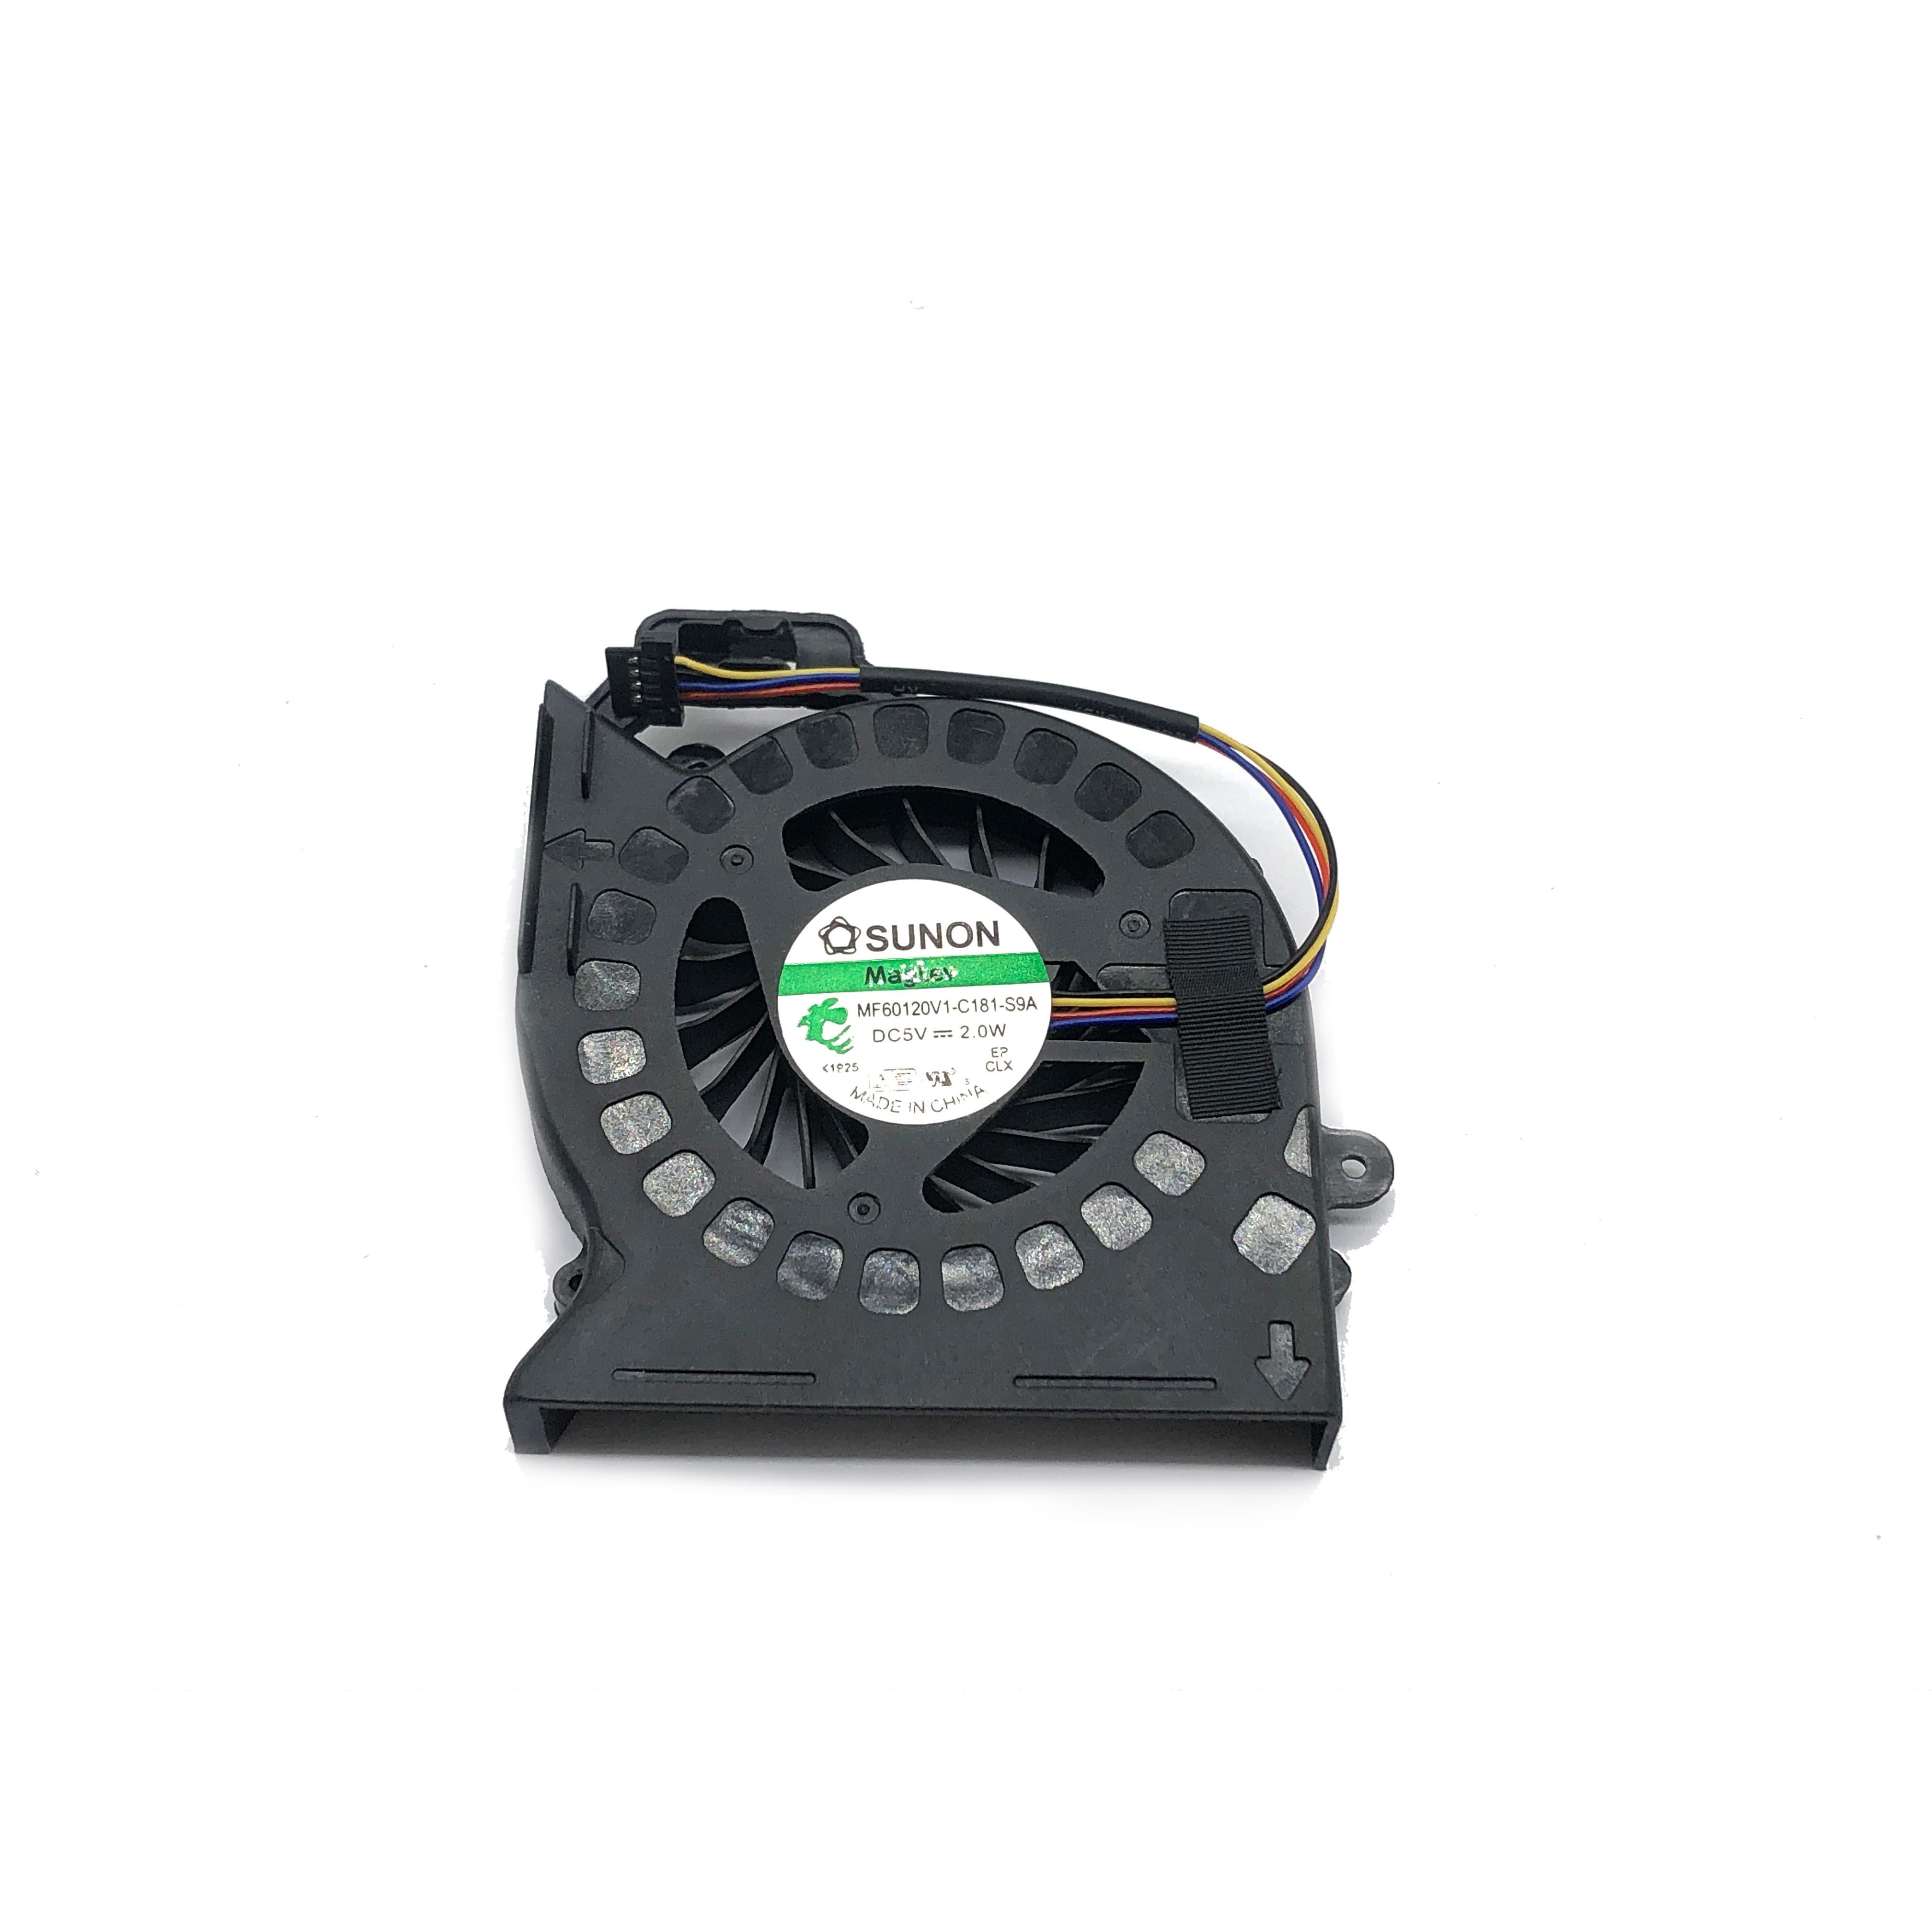 CPU Cooling Fan for HP DV6-6000 DV7-6000 AD6505HX-EEB 653627-001 KSB0505HB